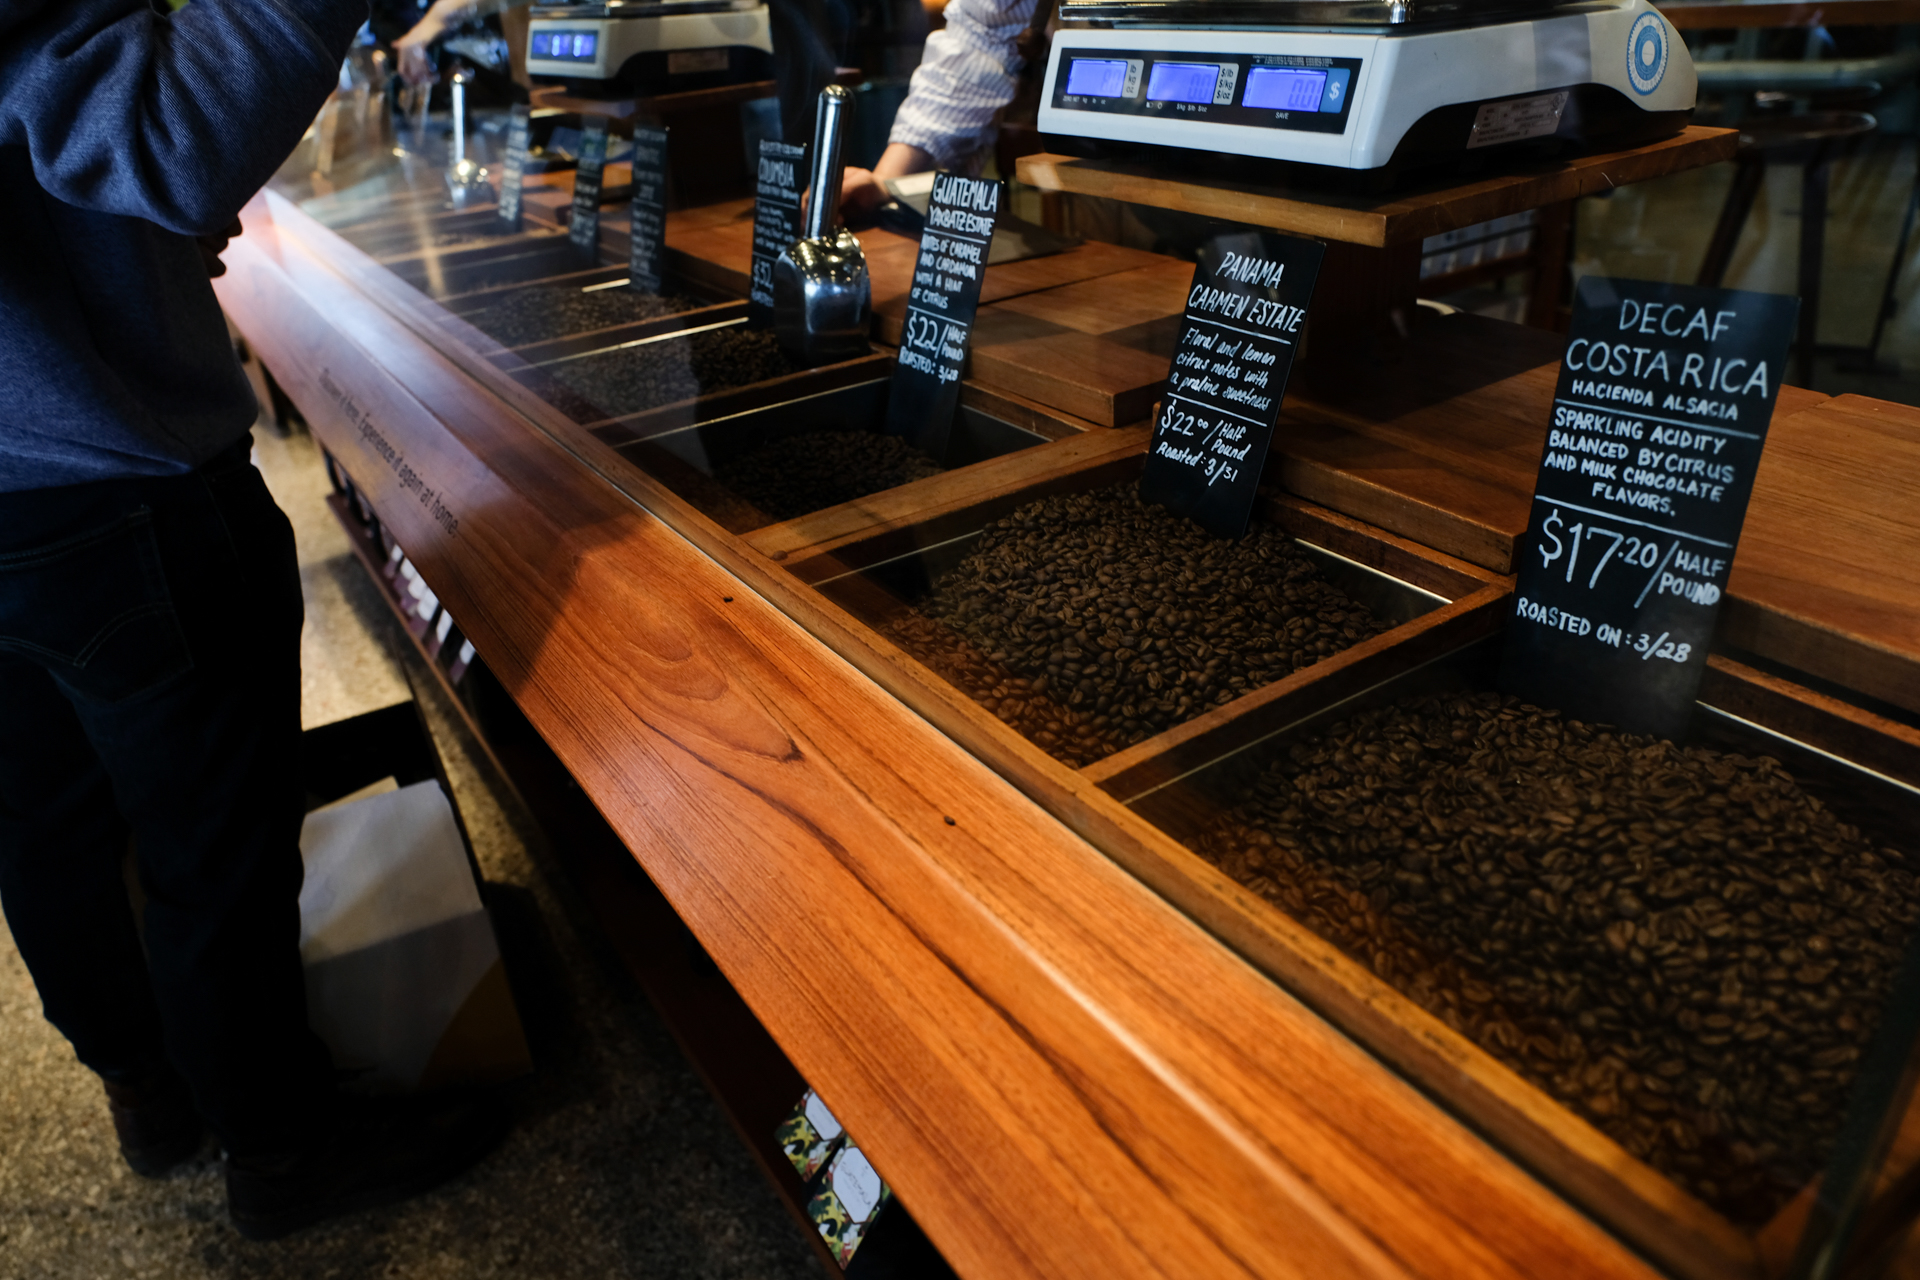 Starbucks Reserve Roastery and Tasting Room  スターバックス リザーブ・ロースタリー&テイスティング・ルーム X-Pro2+XF16-55mmF2.8 R LM WR